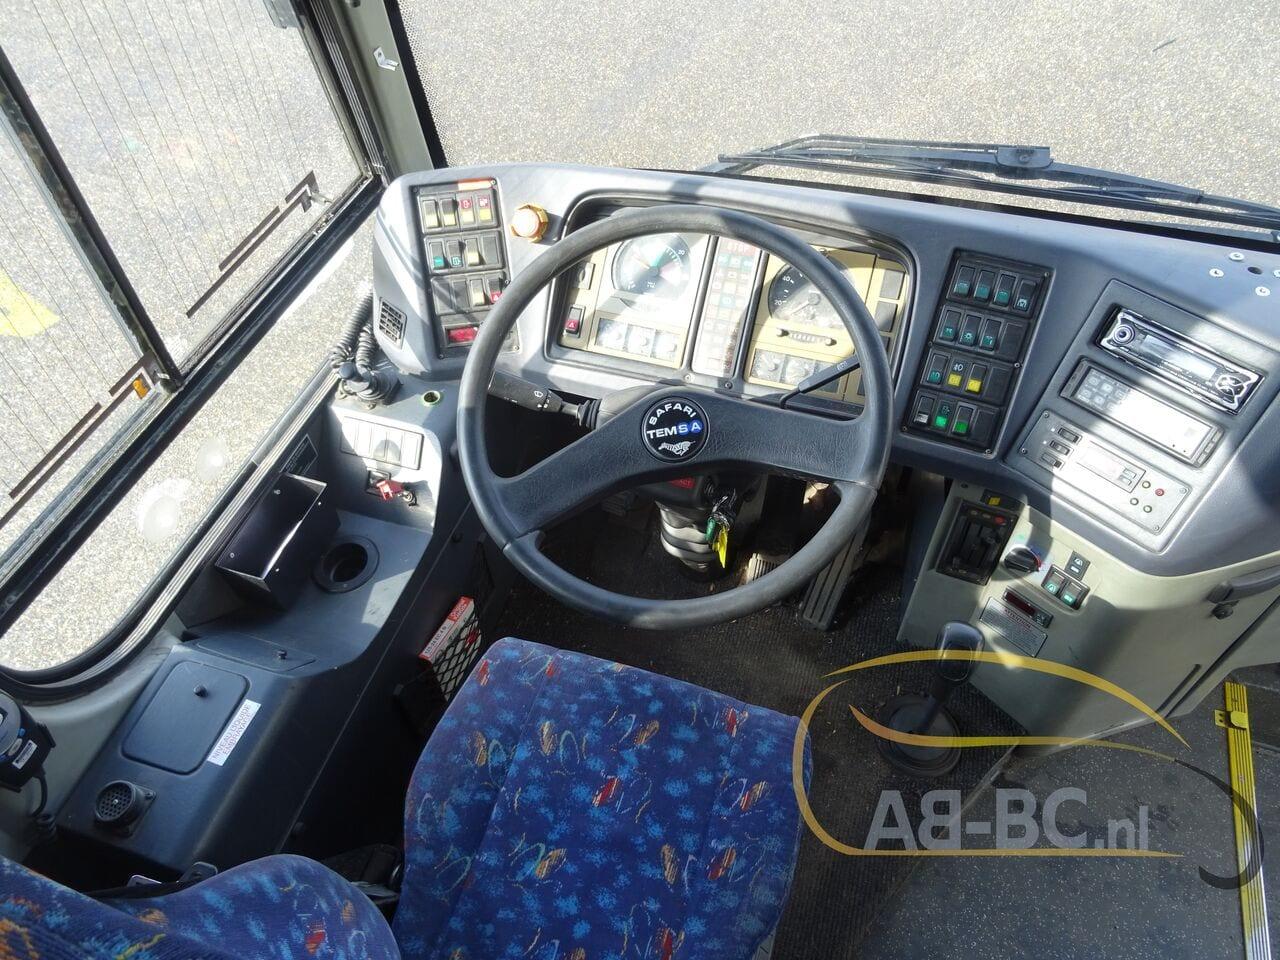 coach-busTEMSA-Safari-RD-65-Seats---1620312076679035449_big_27cddbc90c2039f6523574205877a2d0--21050617272795316700